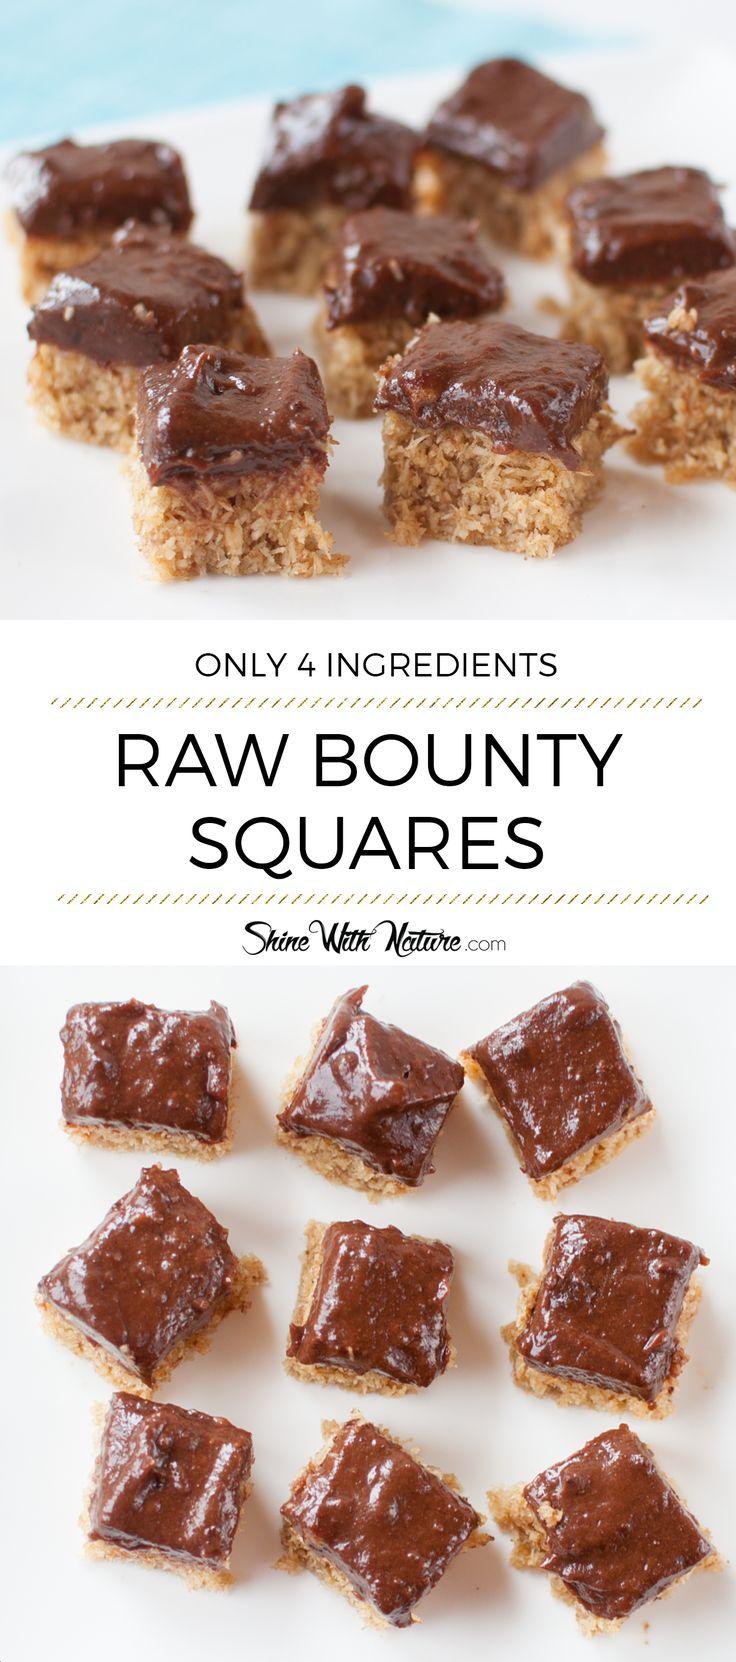 Recipe // Cacao Powder + Dates + Coconut Milk + Date Paste + Vanilla + Coconut Flakes